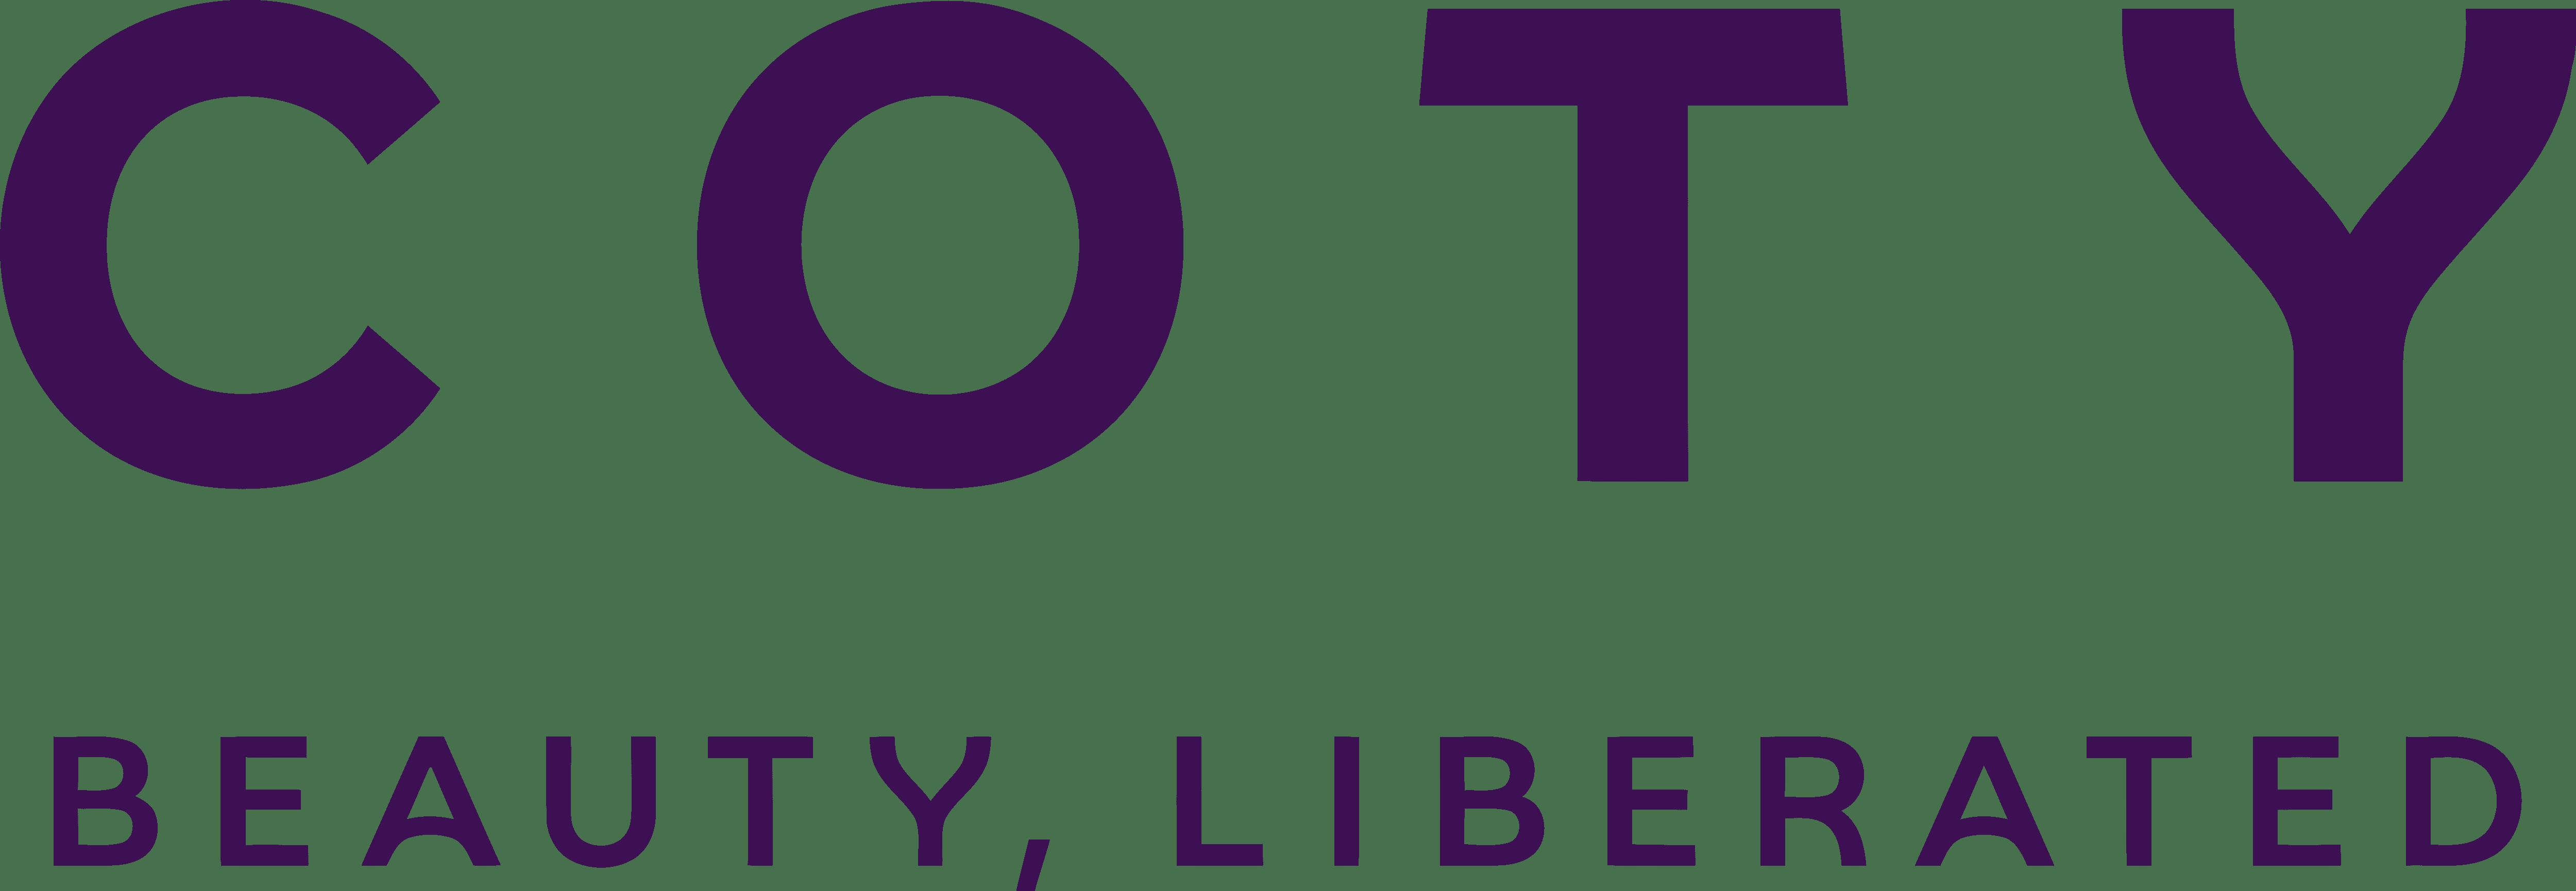 coty-logo